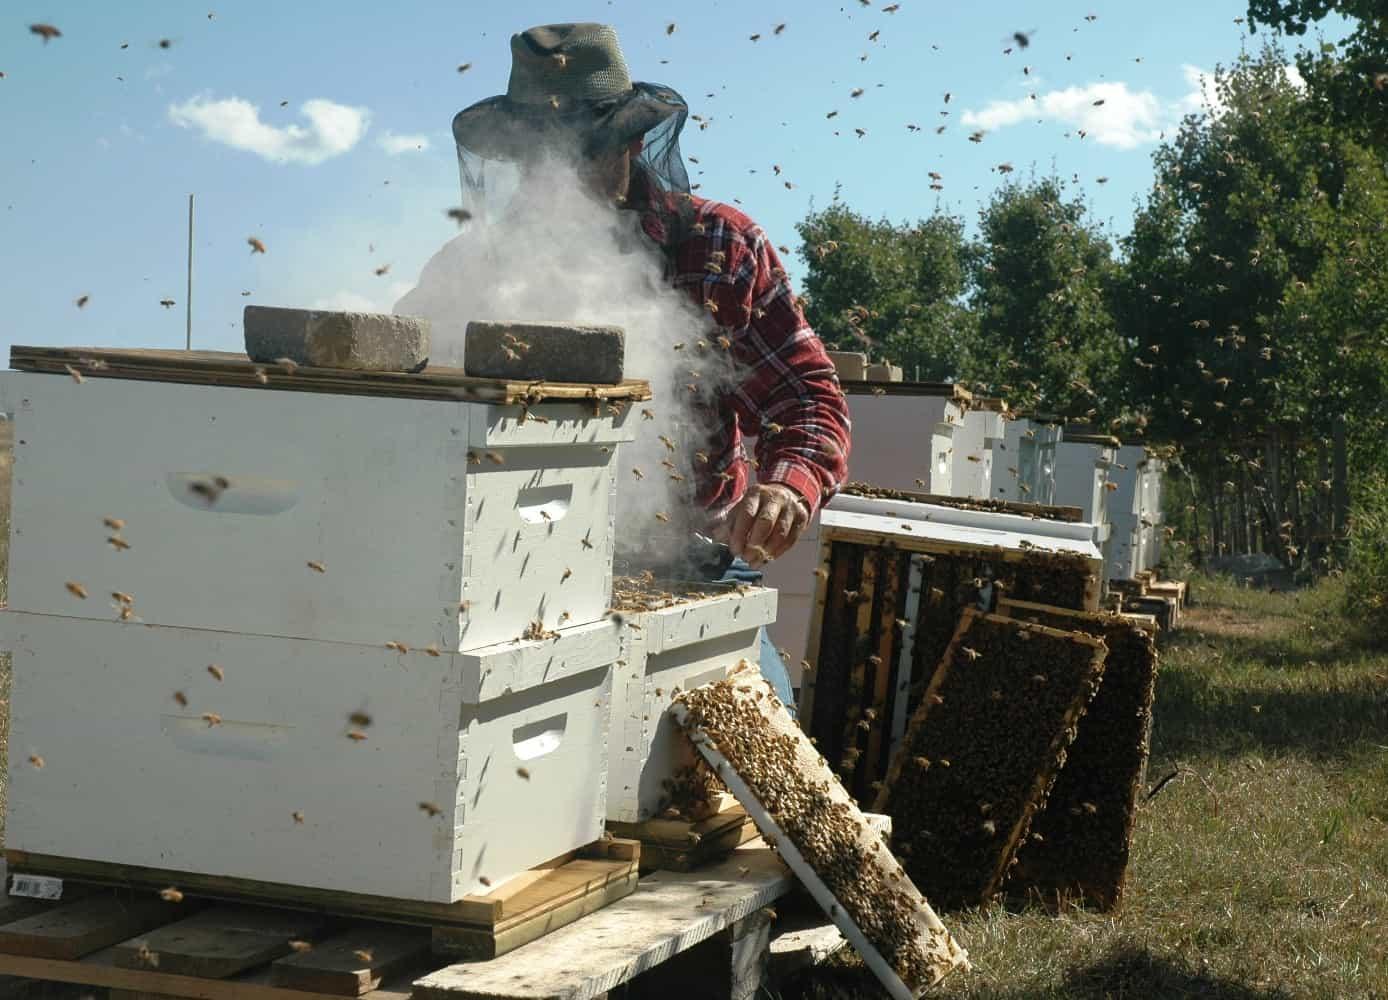 FBI Nabs Bees for Honey Mastermind